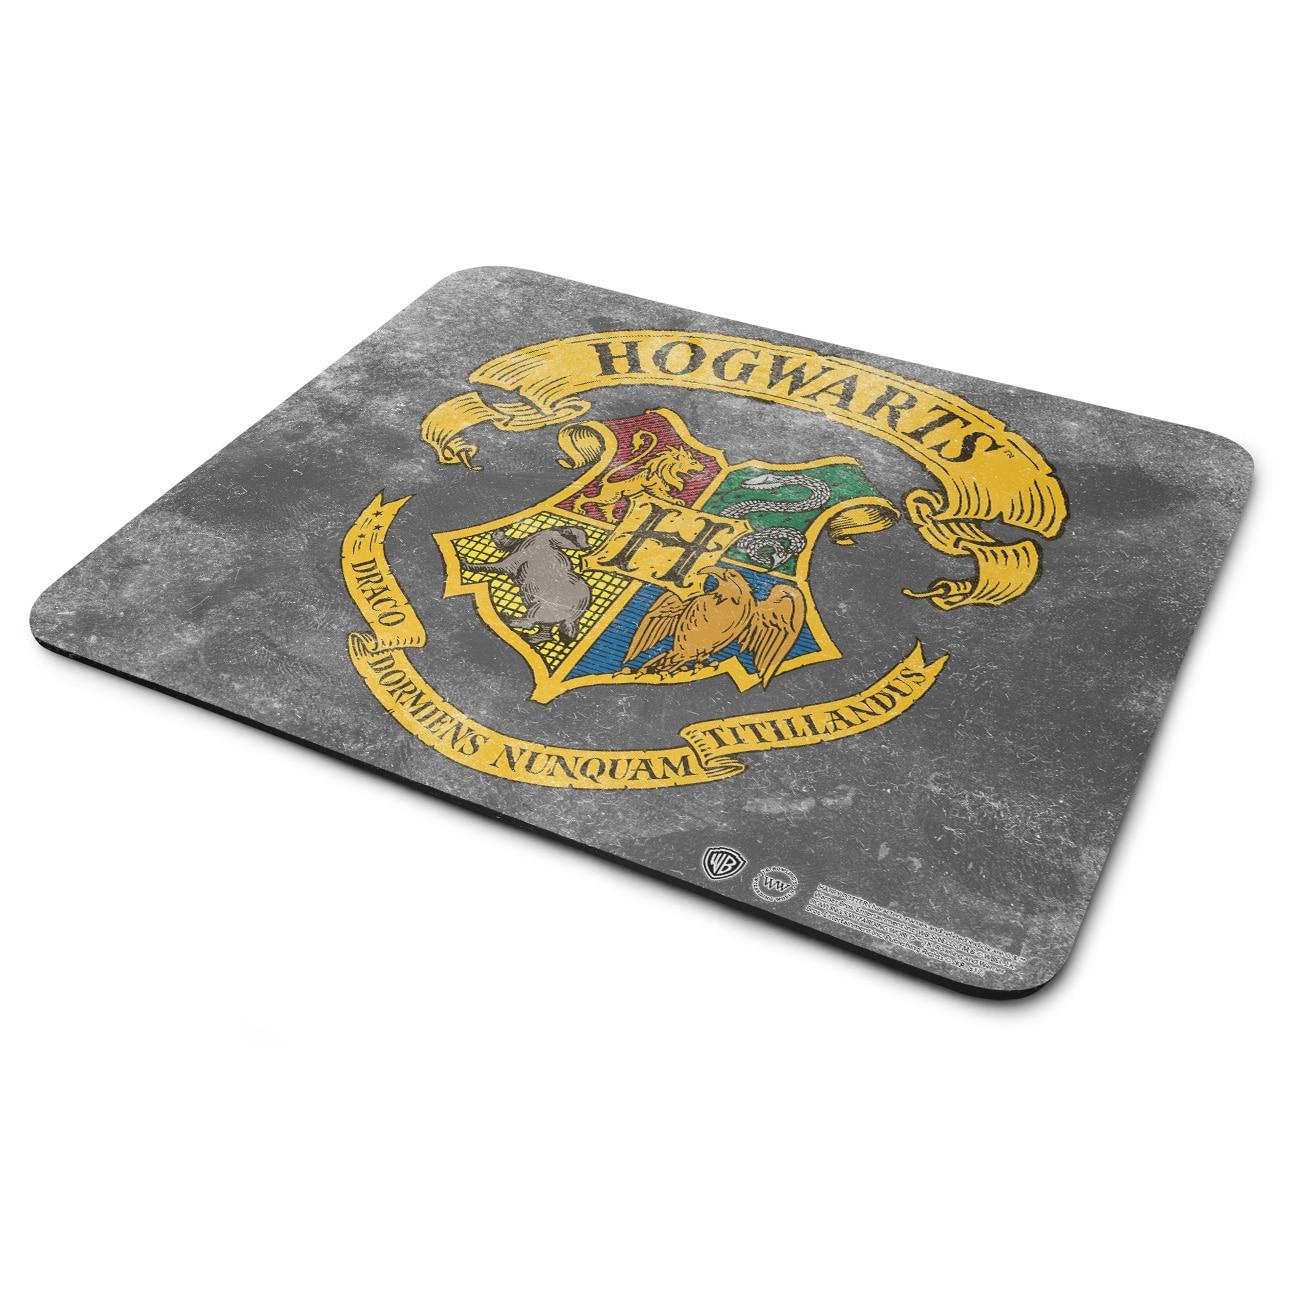 Hogwarts Crest Mouse Pad 3-Pack